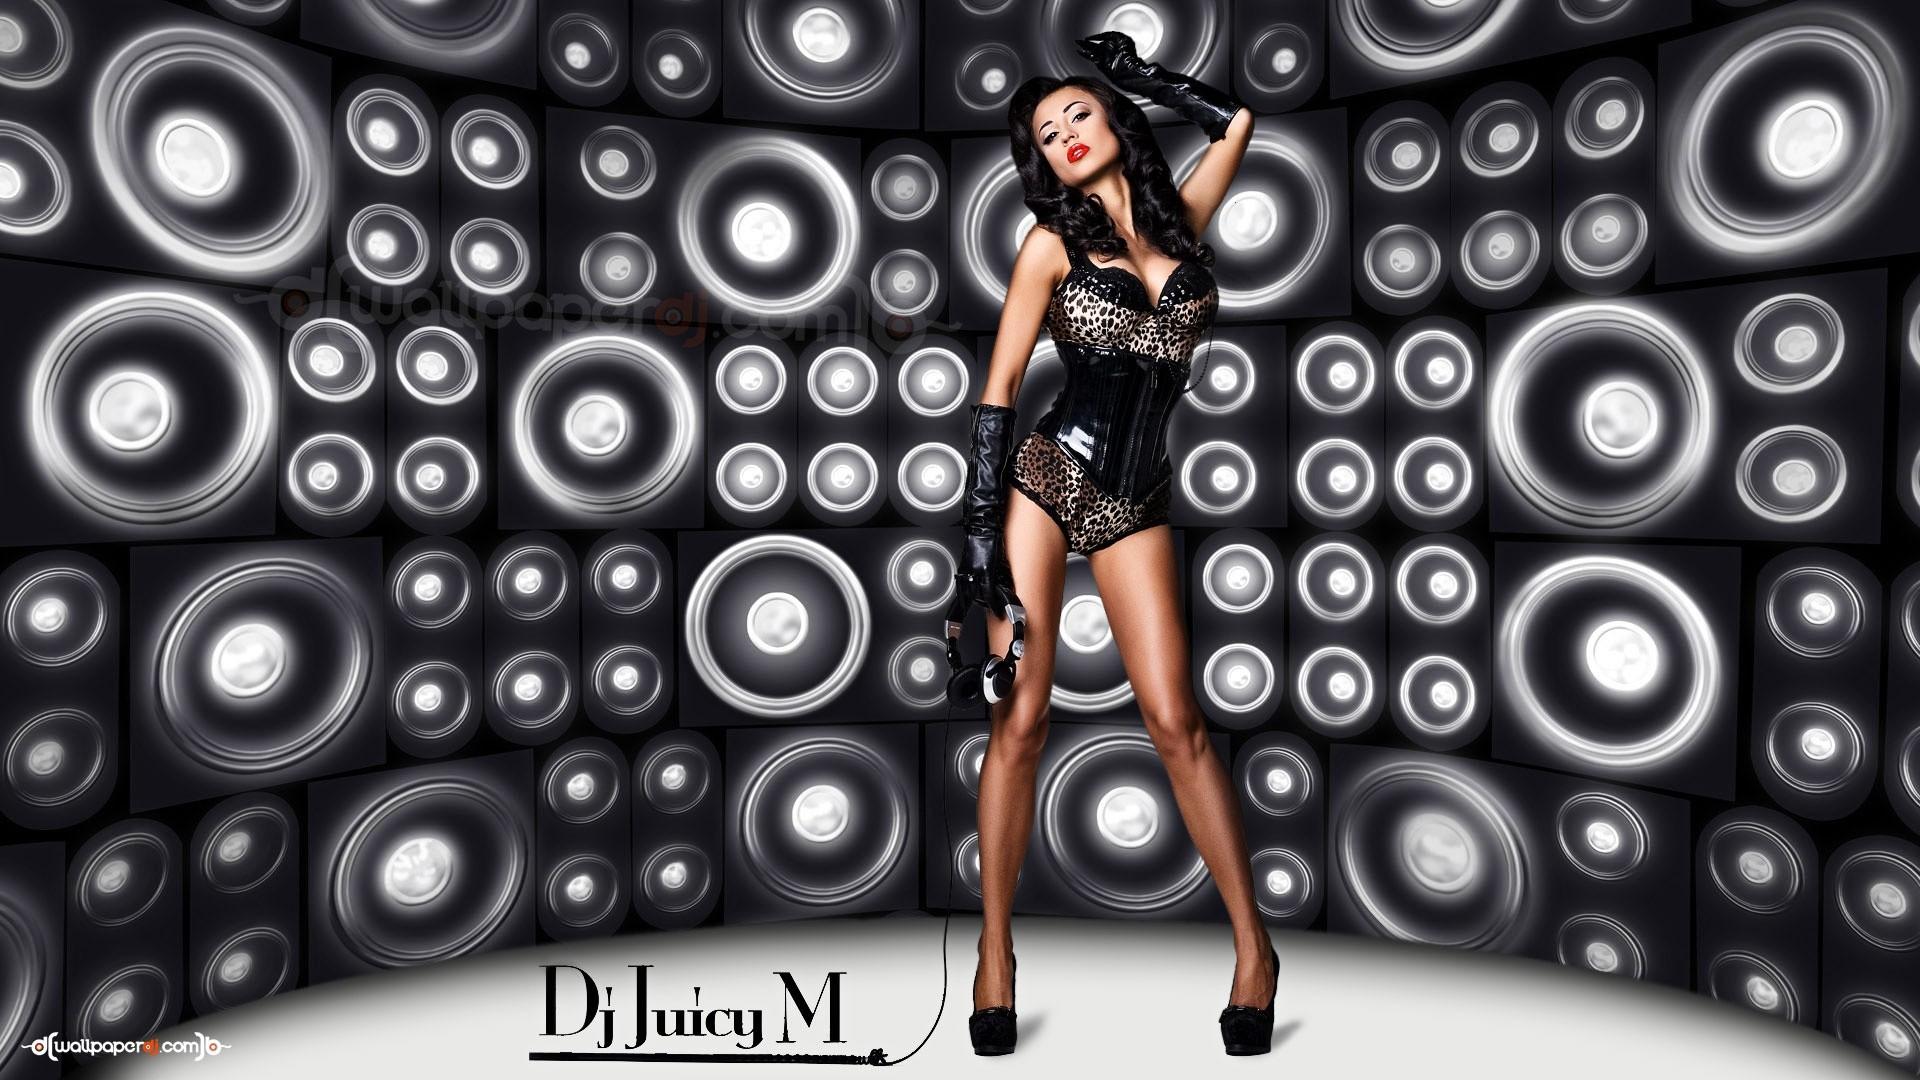 Dj Juicy M wallpaper, music and dance wallpapers